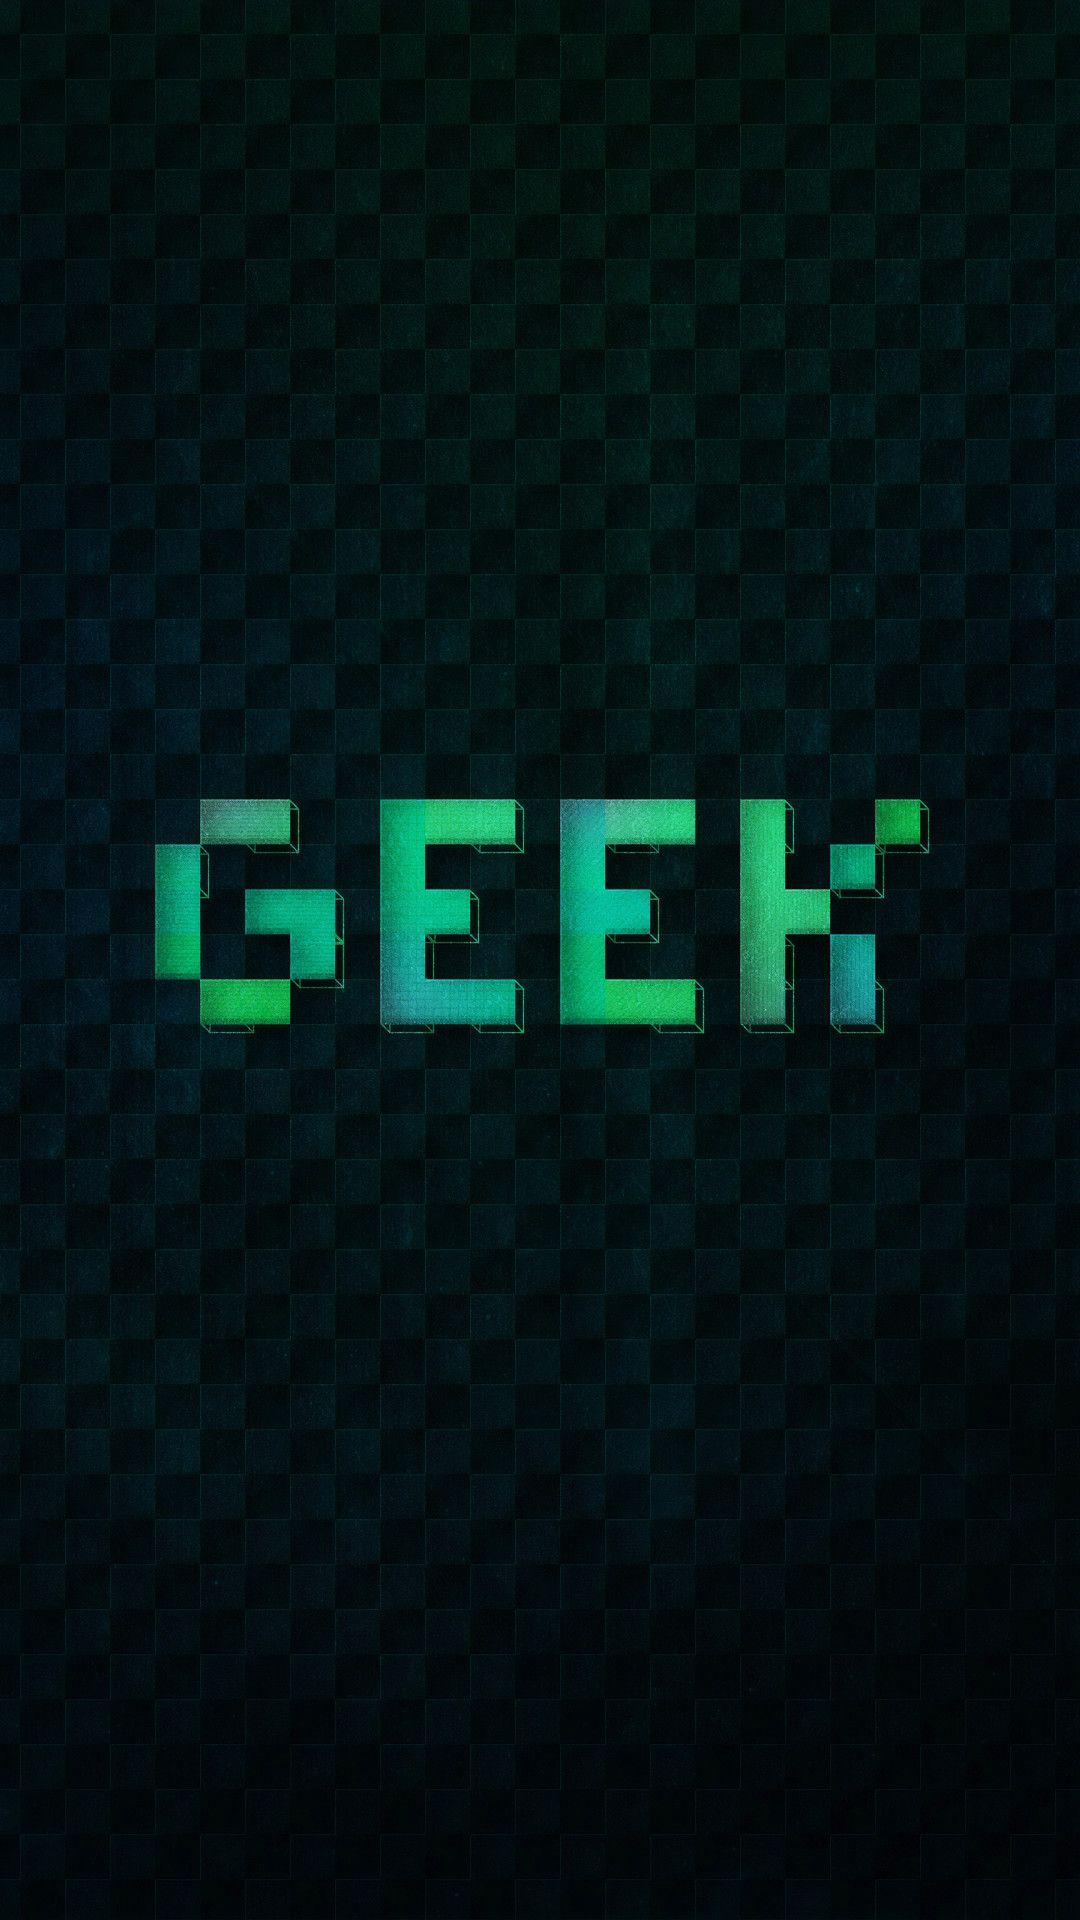 Geek Mobile Wallpaper (iPhone, Android, Samsung, Pixel